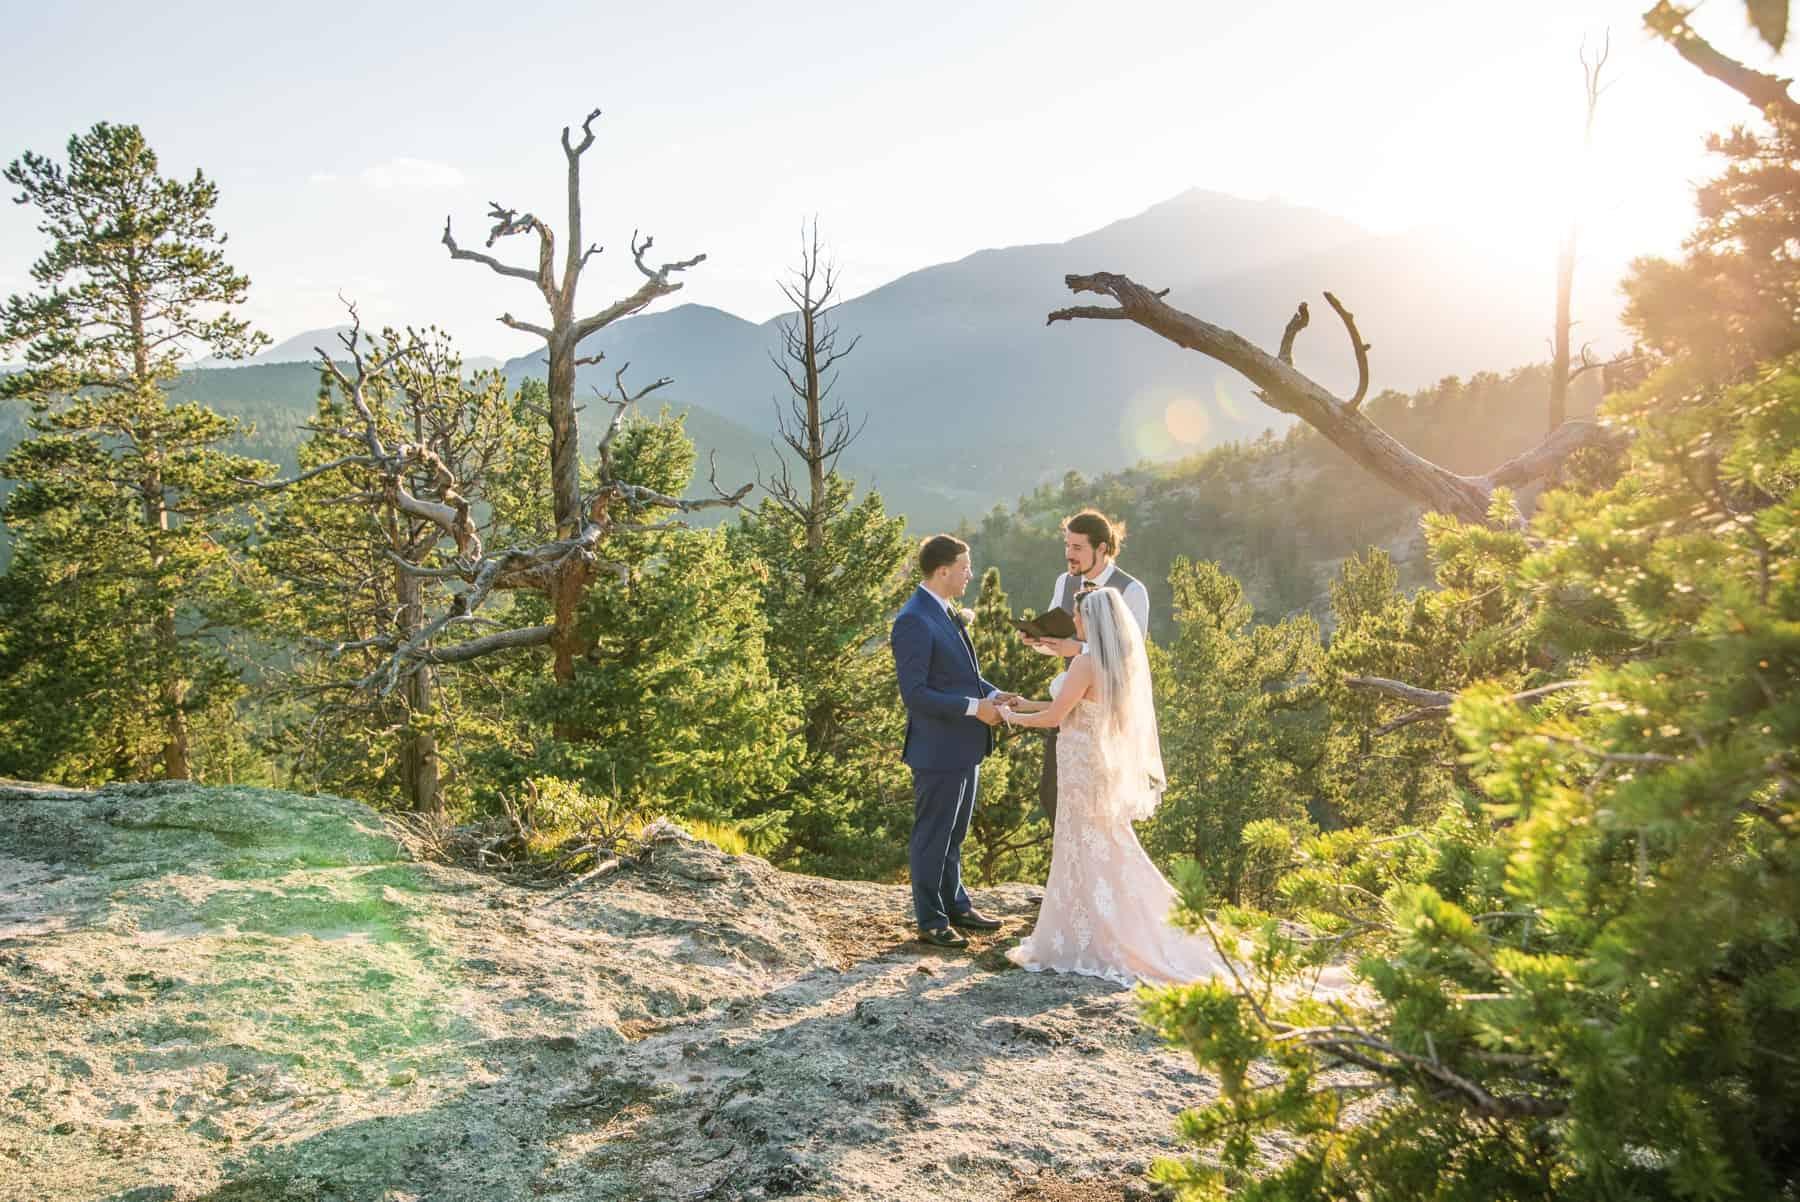 Adventure Wedding in Allenspark, CO